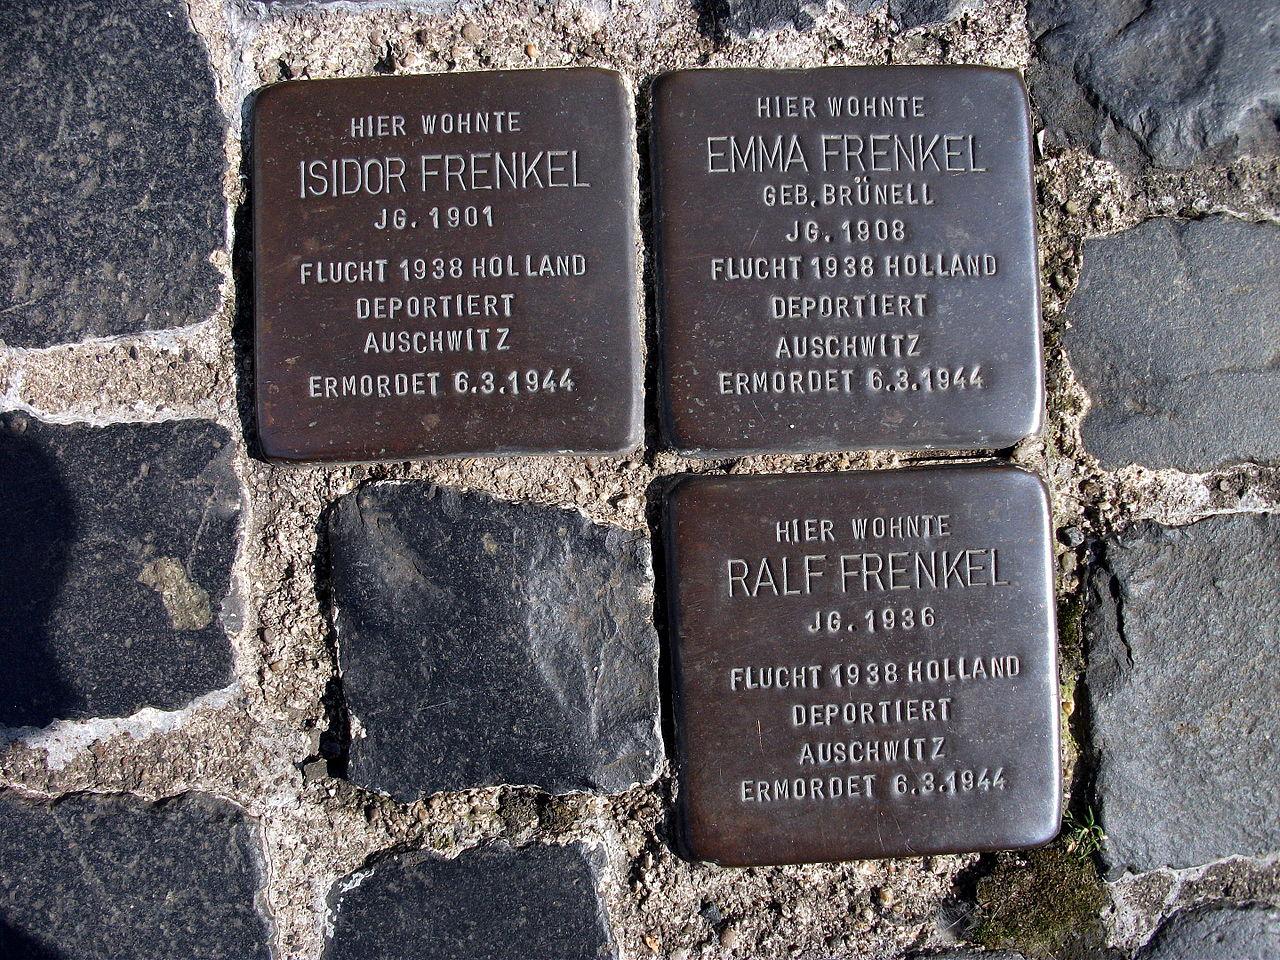 Stolpersteins Isidor Frenkel, Emma Frenkel, Ralf Frenkel Crossing Burgstraße Im Äuelchen Bonn.JPG